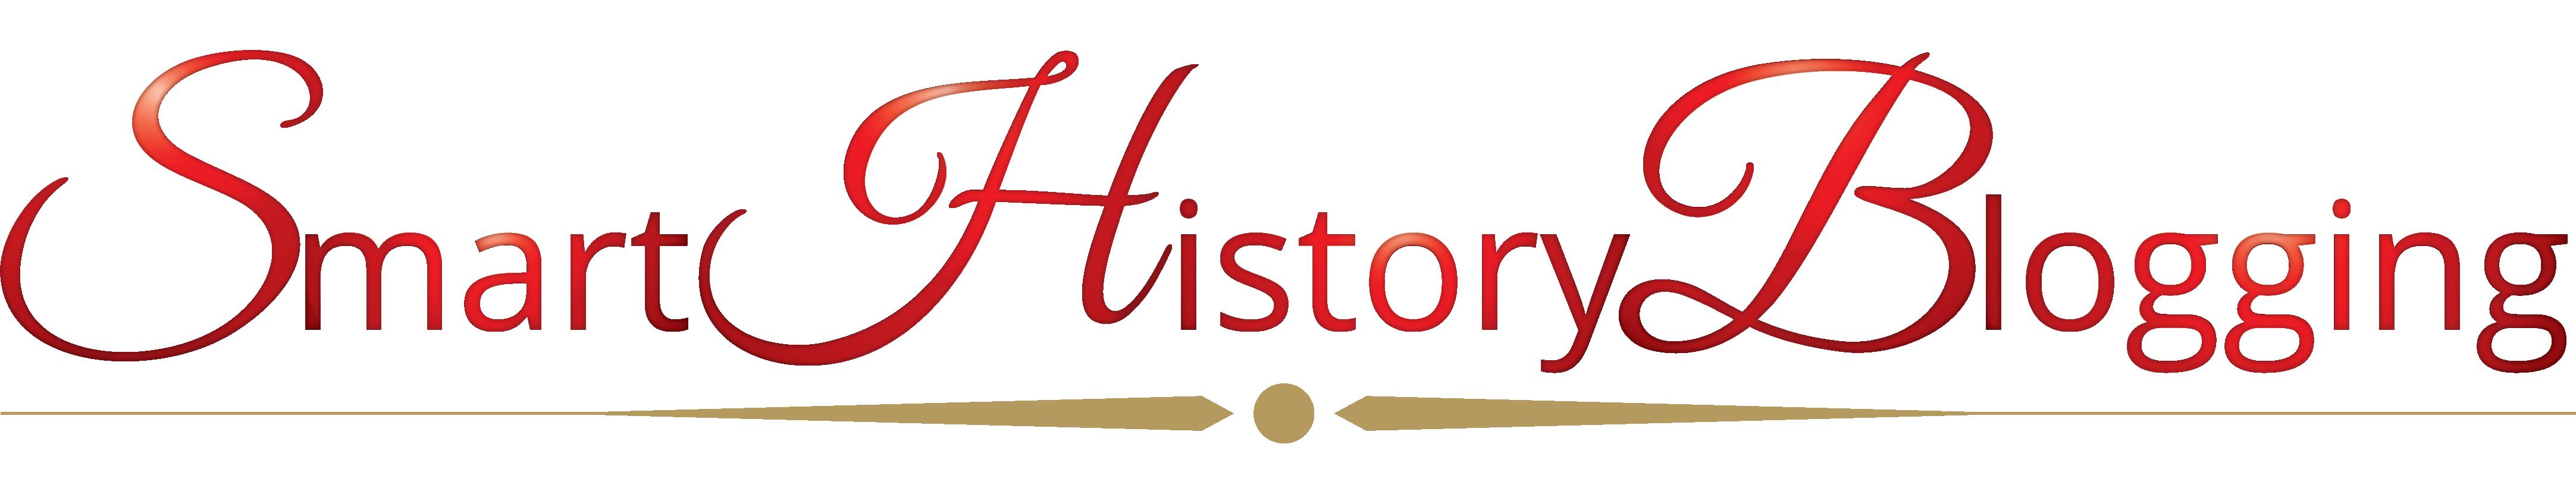 Smart History Blogging